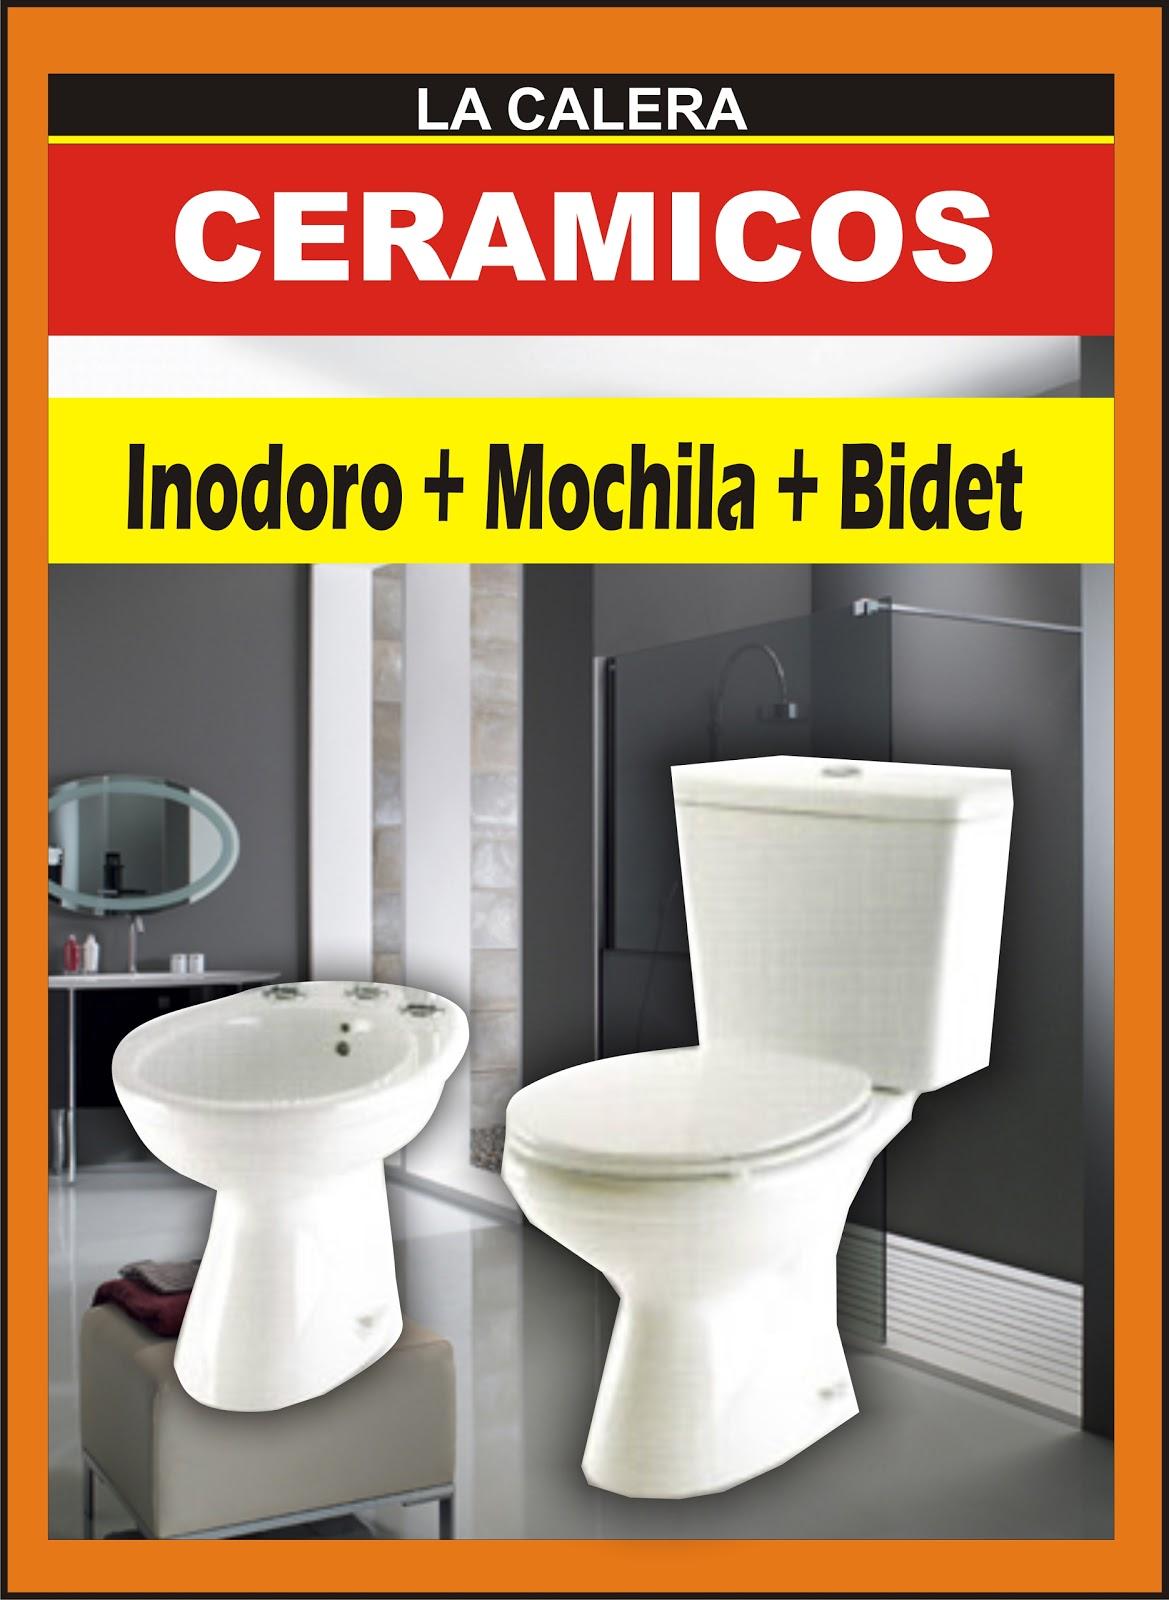 Inodoro mochila bidet inodoros a ars 980 en for Mochila para inodoro